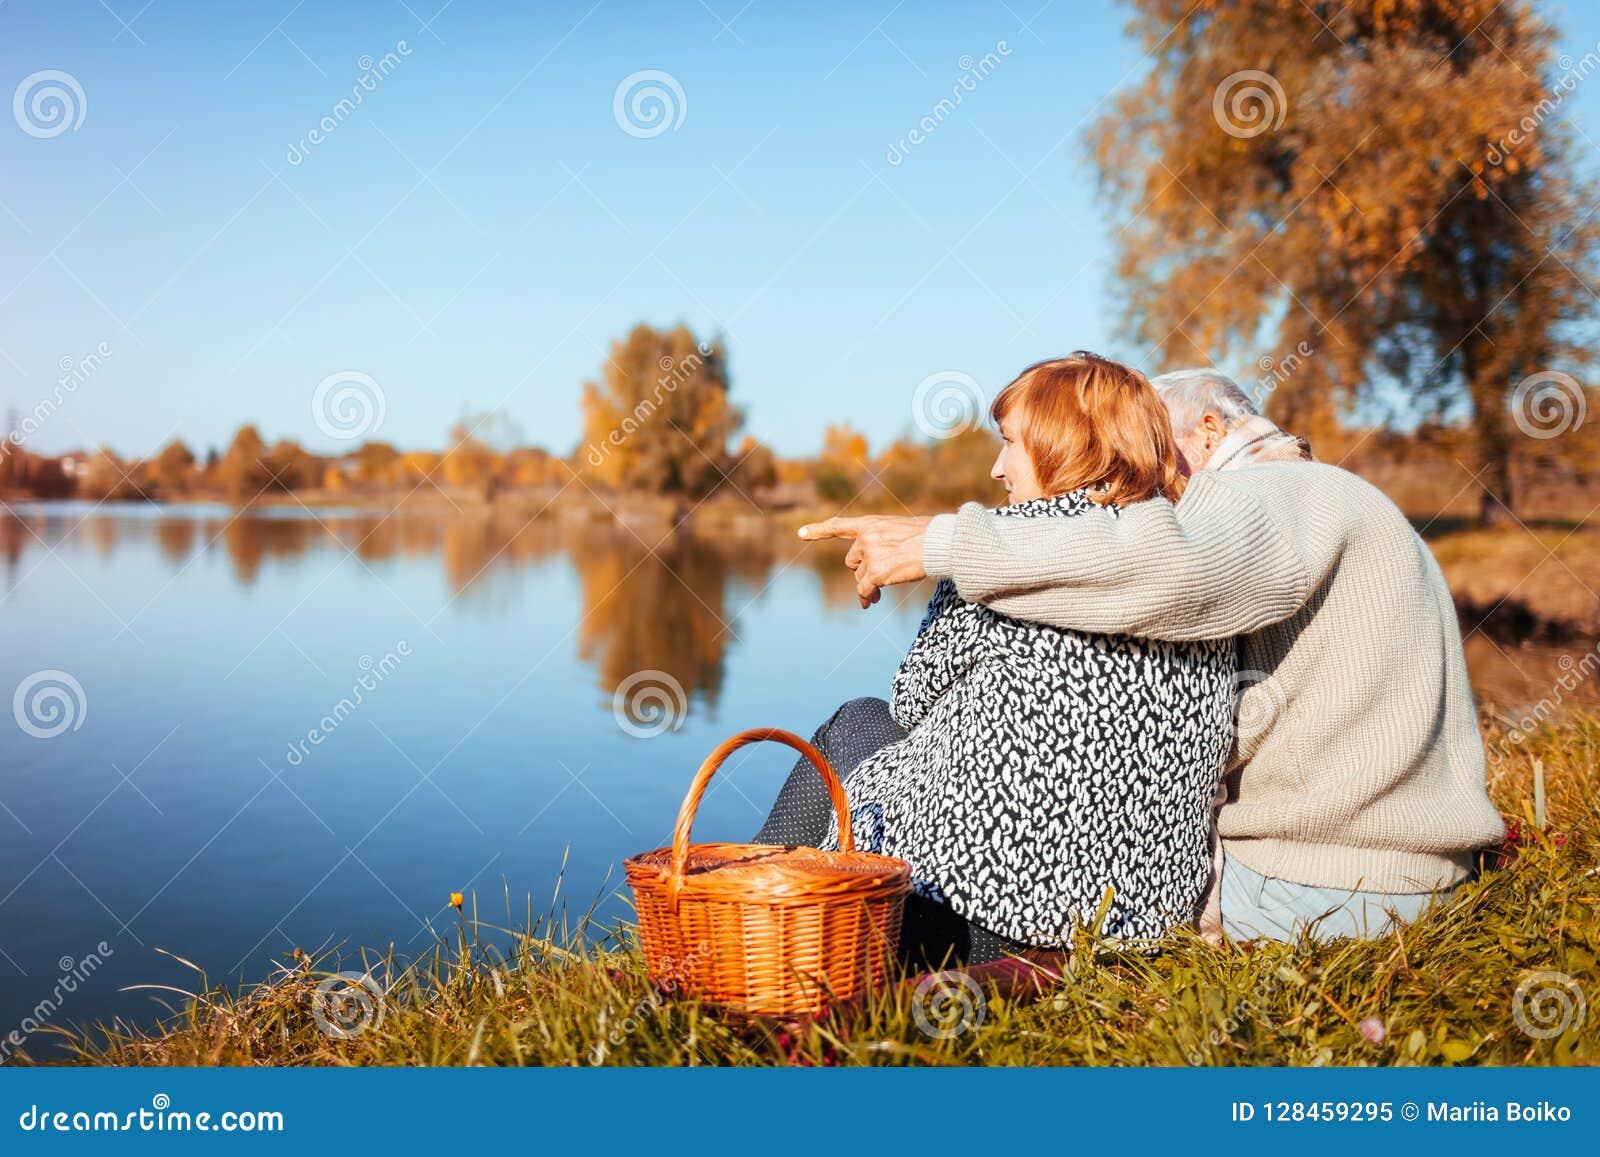 Senior couple having picnic by autumn lake. Happy man and woman enjoying nature and hugging